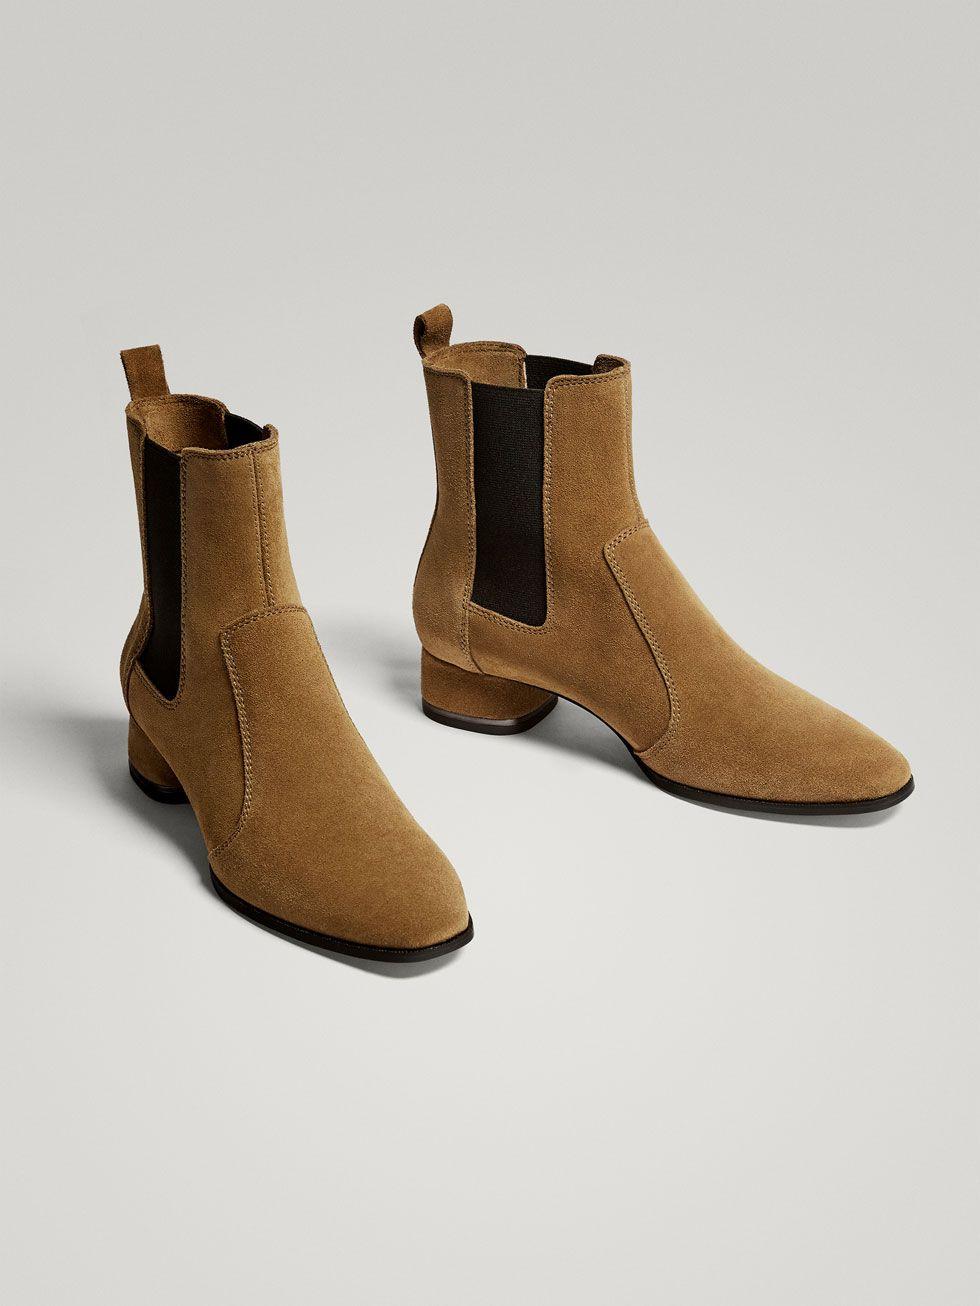 71fa2e87d06 Essentials - Shoes - COLLECTION - WOMEN - Massimo Dutti - United ...